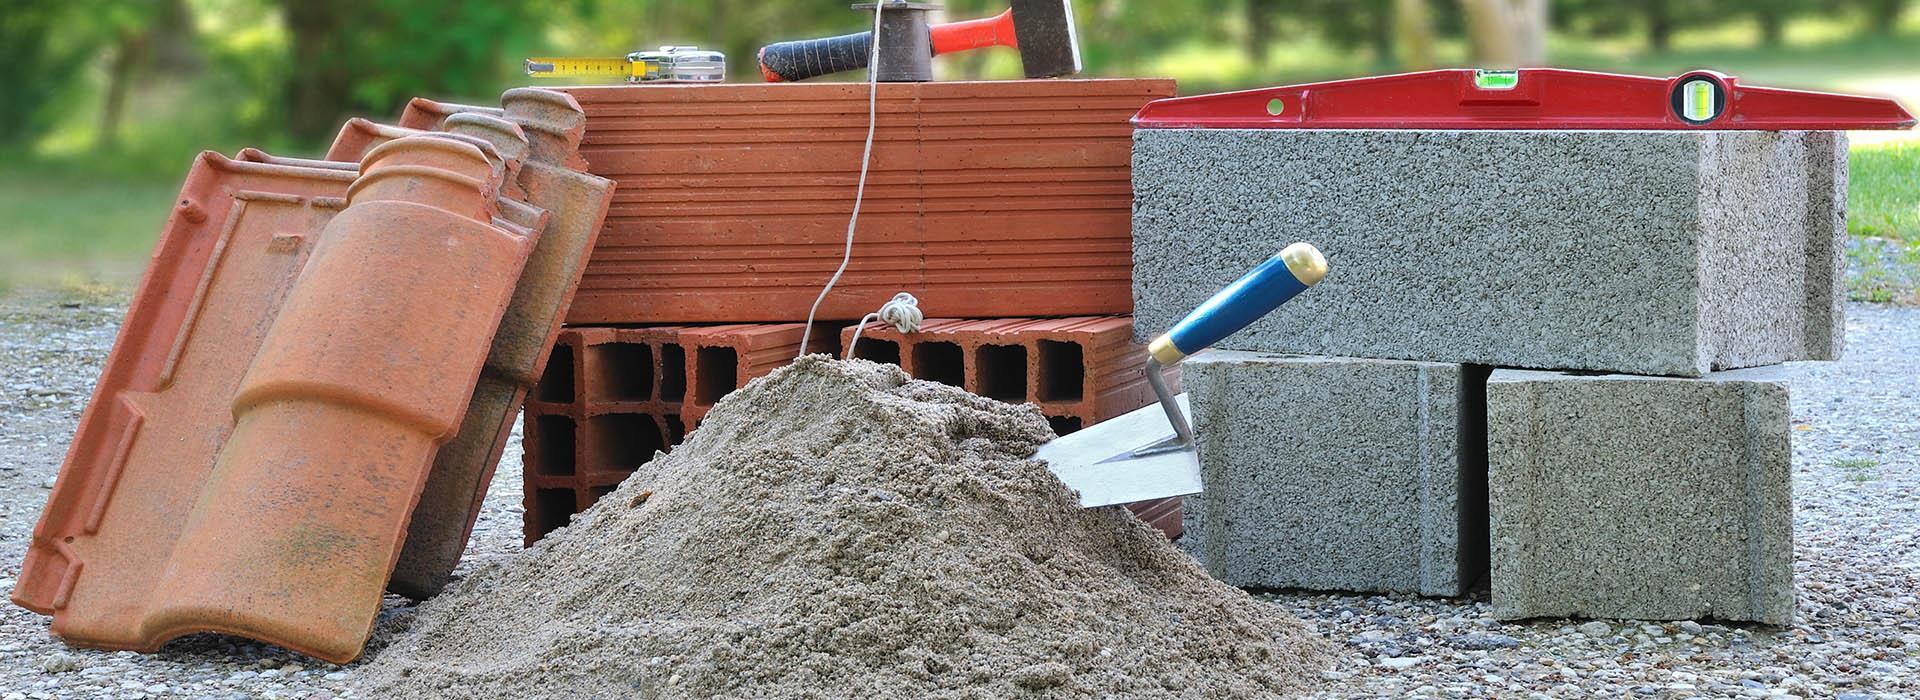 Aument un 15 5 la venta de materiales para la construcci n adn - Empresas de materiales de construccion ...